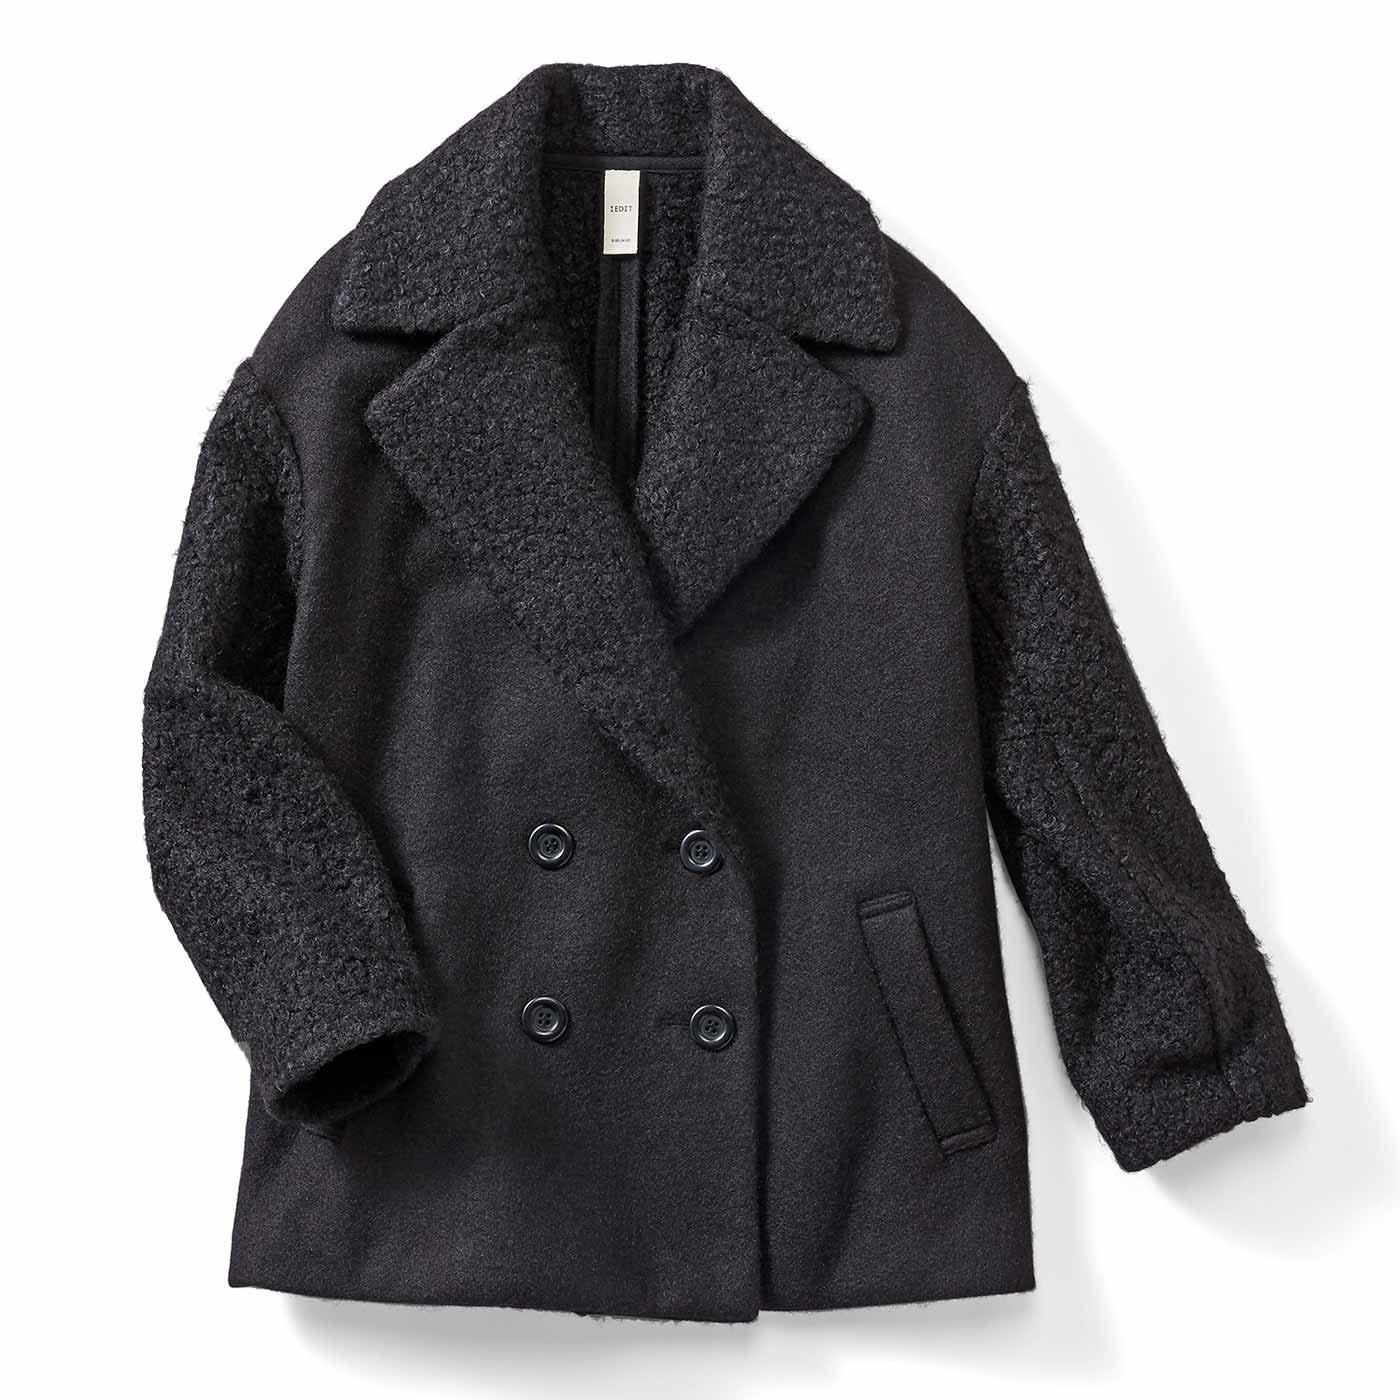 IEDIT[イディット] ジャケット以上コート未満の大きめラペルとオーバーサイズが今気分のジャコット〈ブラック〉